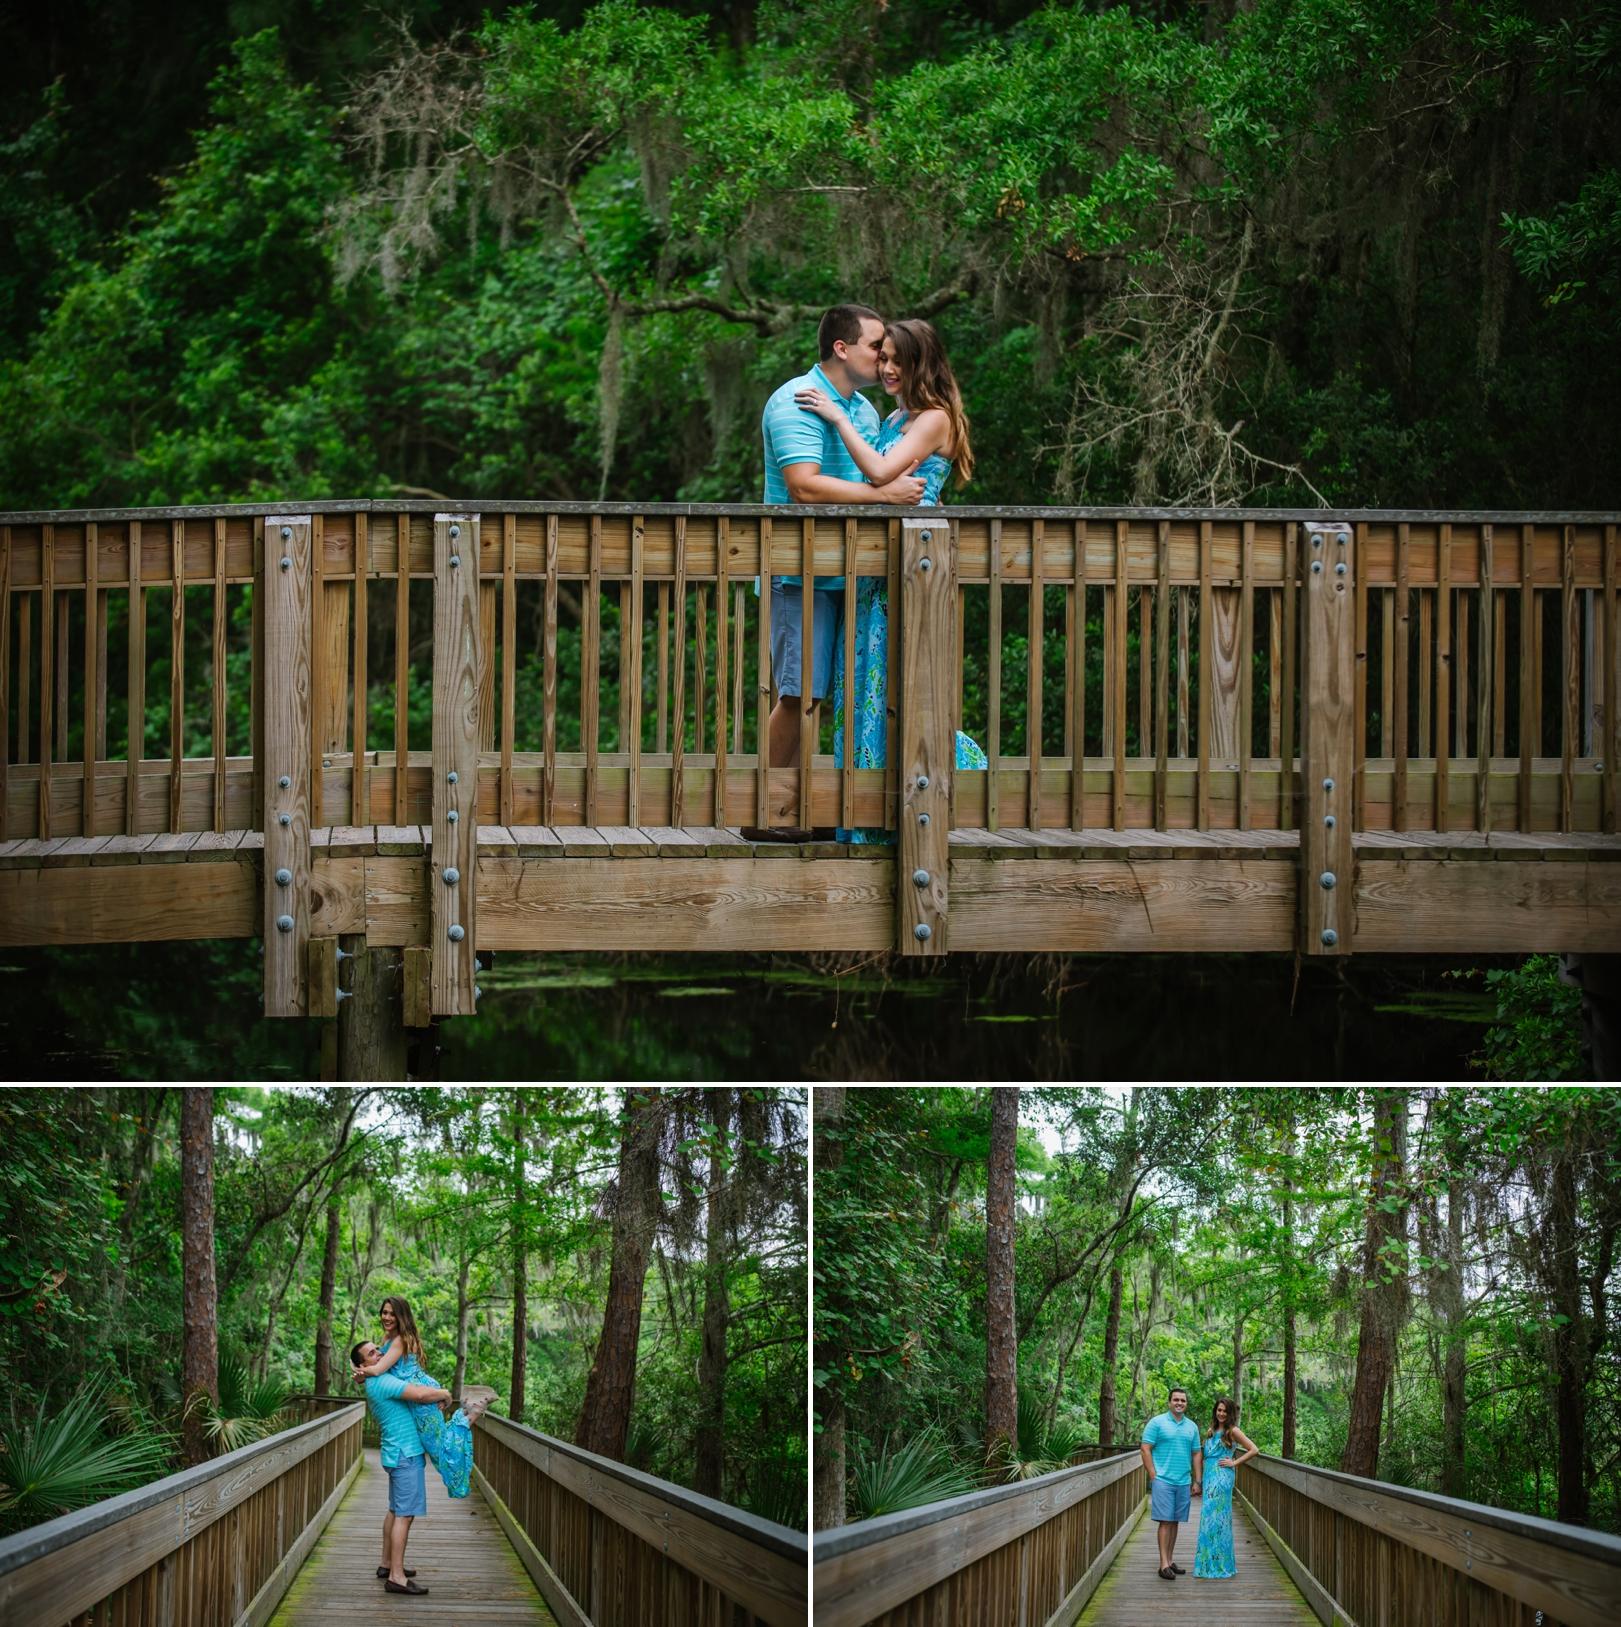 ashlee-hamon-photography-tampa-springs-outdoor-engagement_0001.jpg